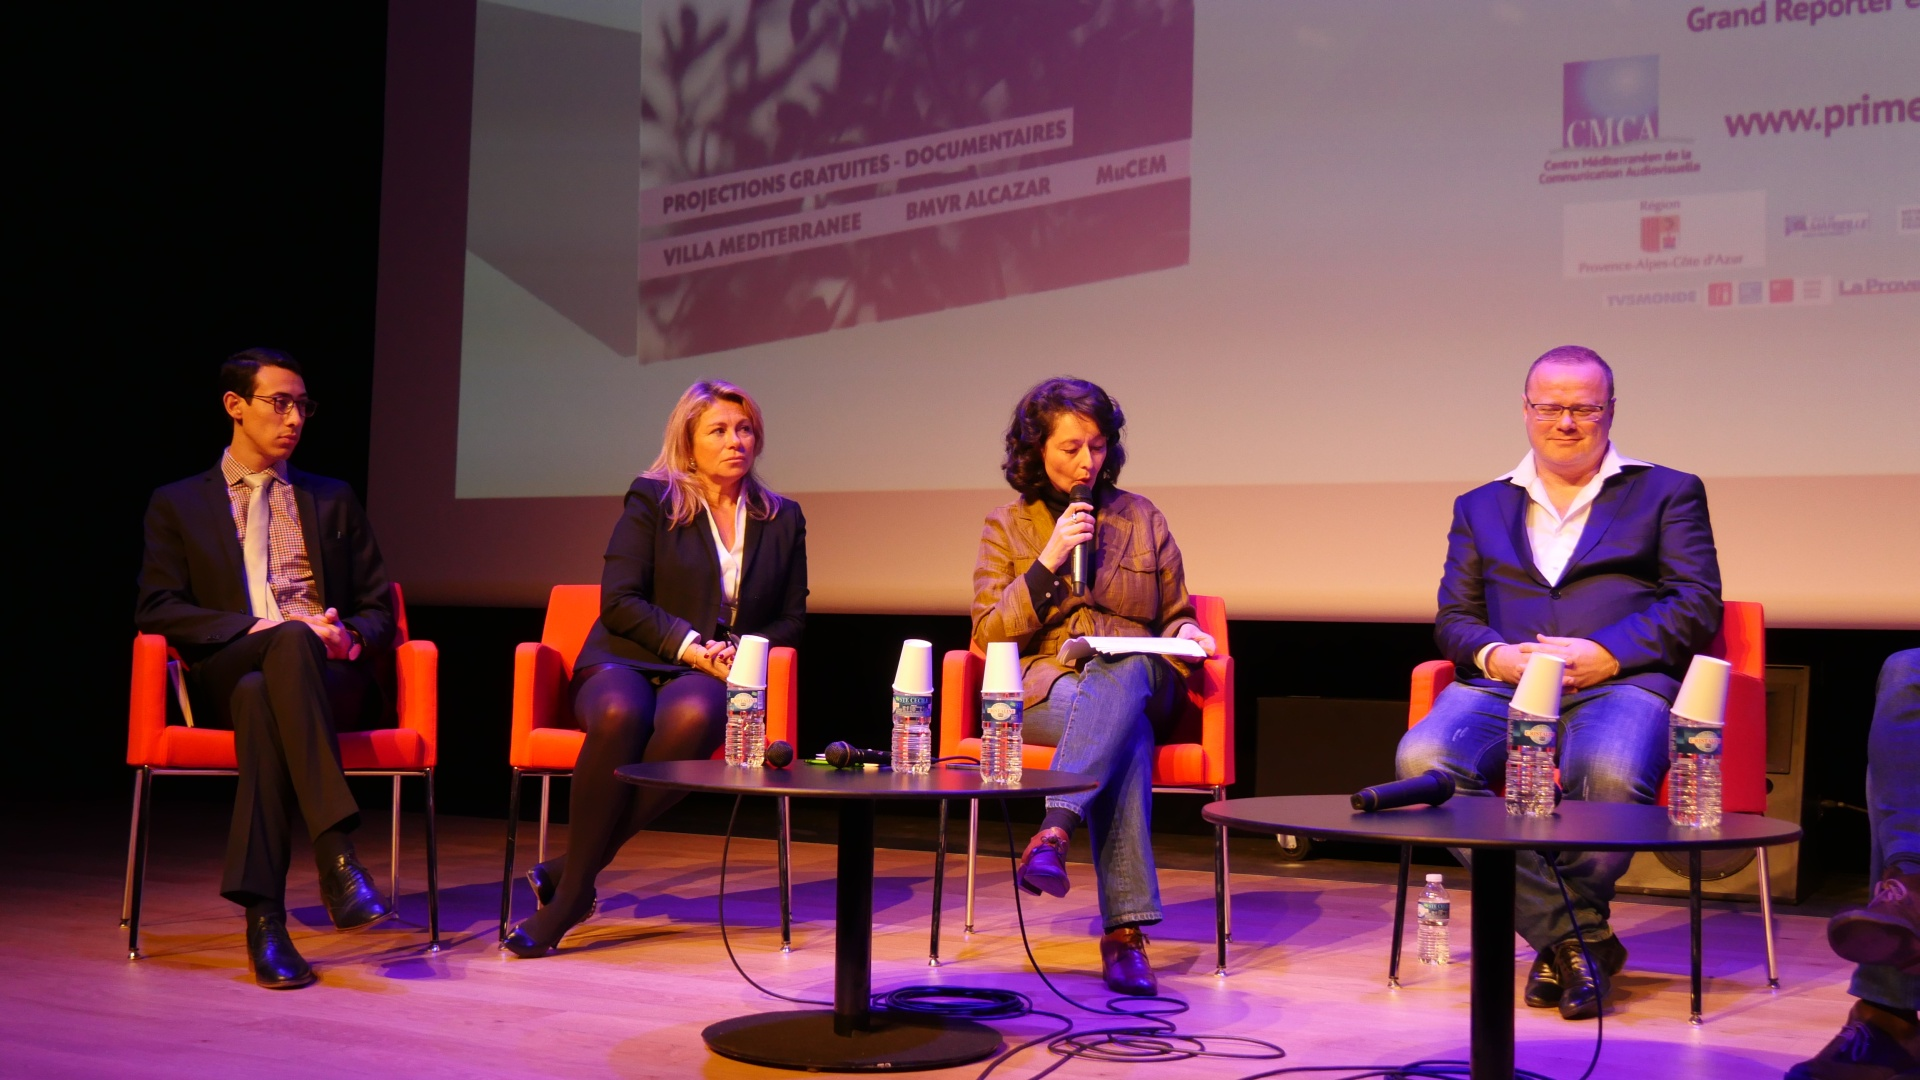 Nora Boubetra animatrice de la conférence